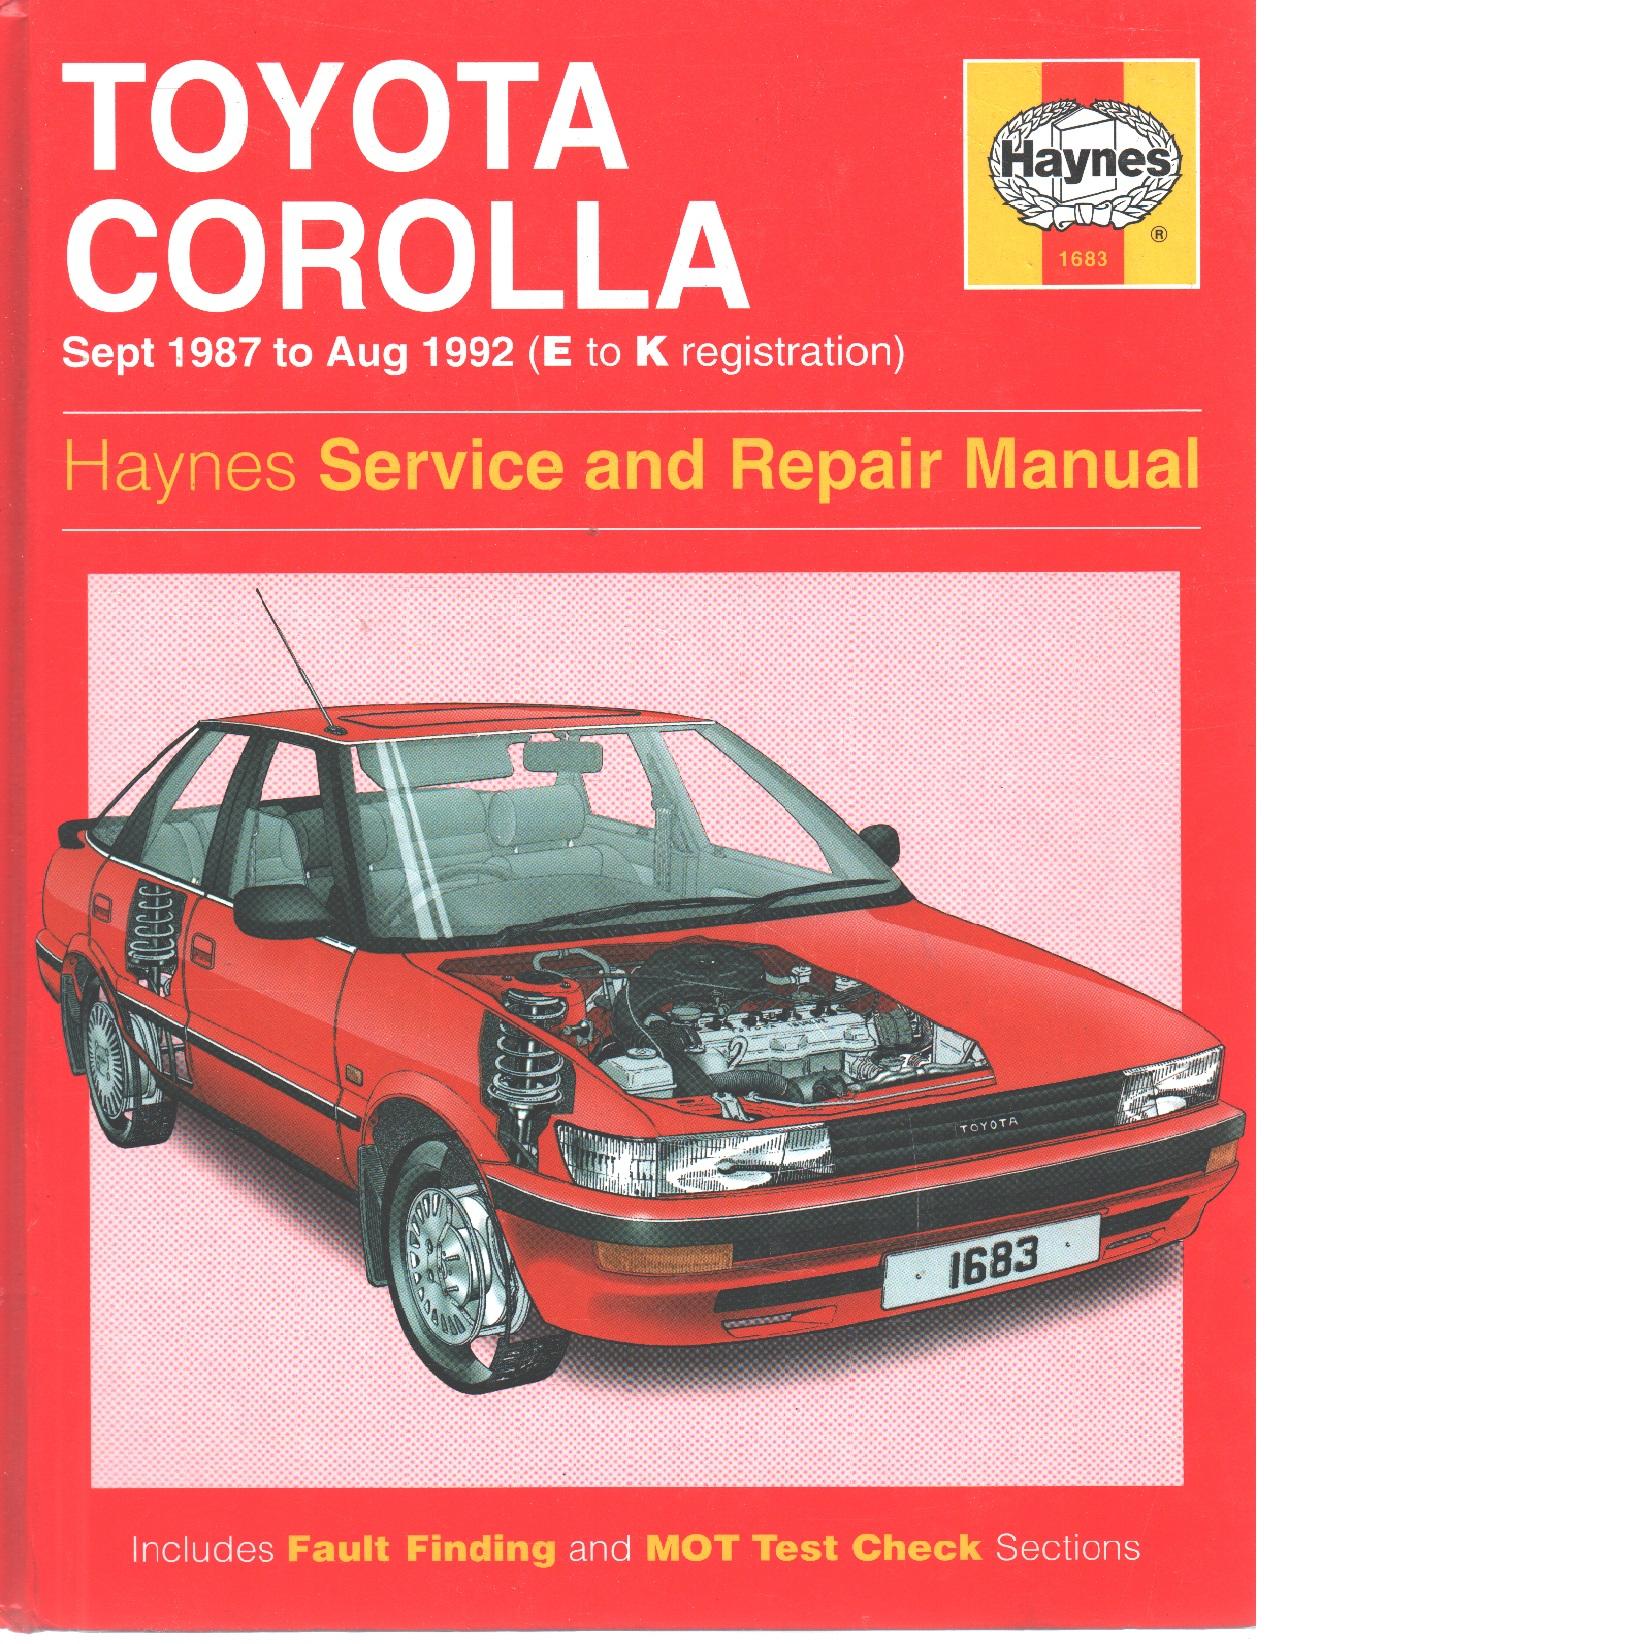 Toyota Corolla Sept 1987 to Aug 1992 - Jones. Robert T. H.